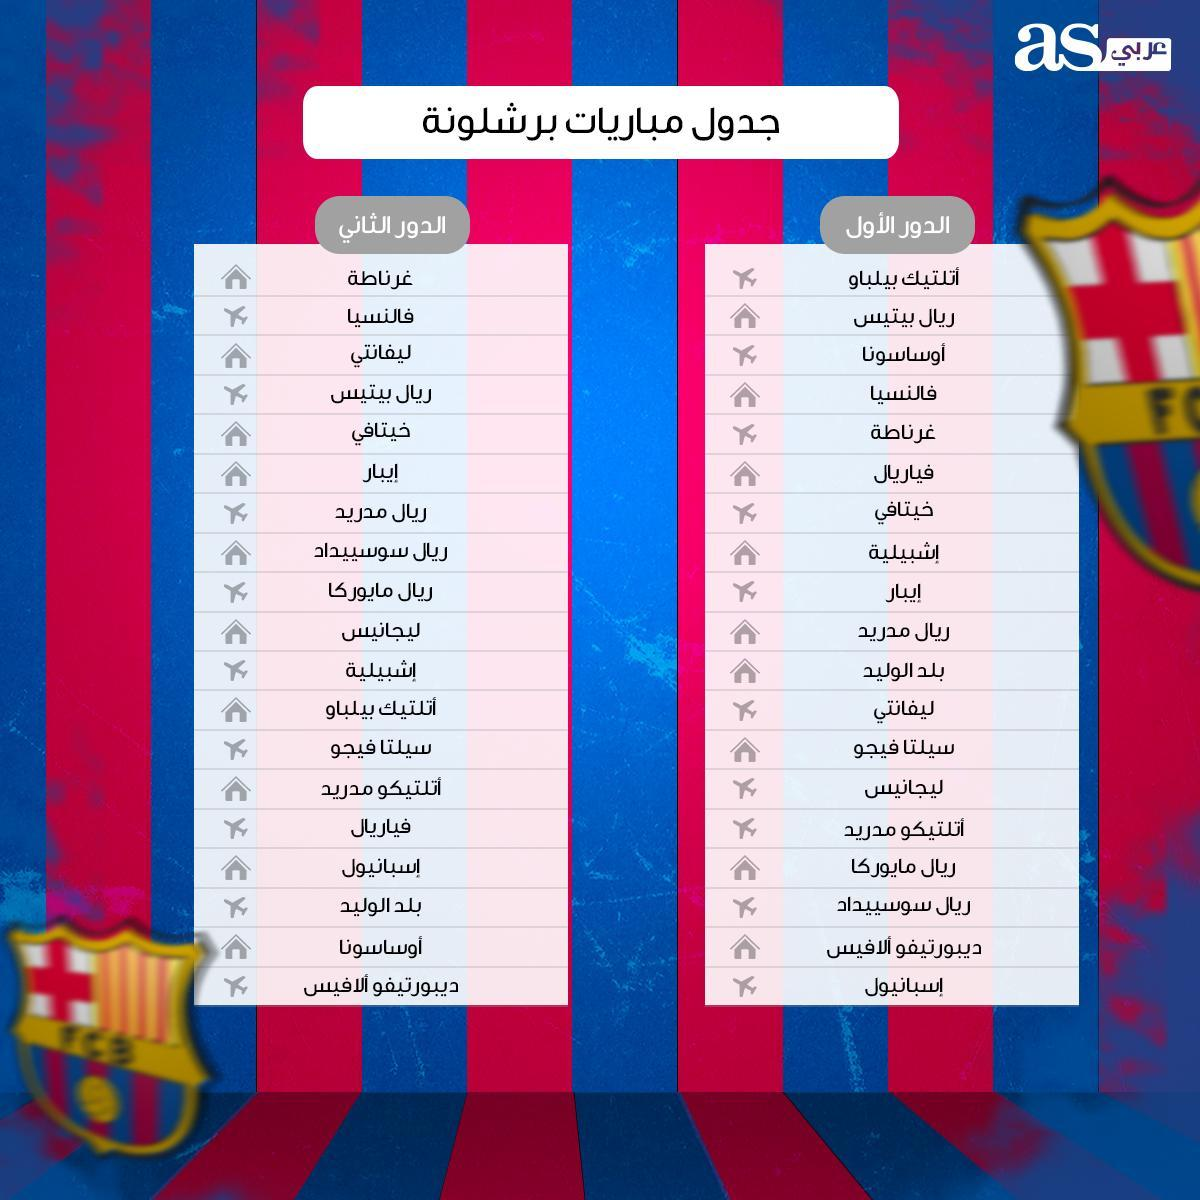 Incampnou On Twitter As جدول مباريات برشلونة في الدوري